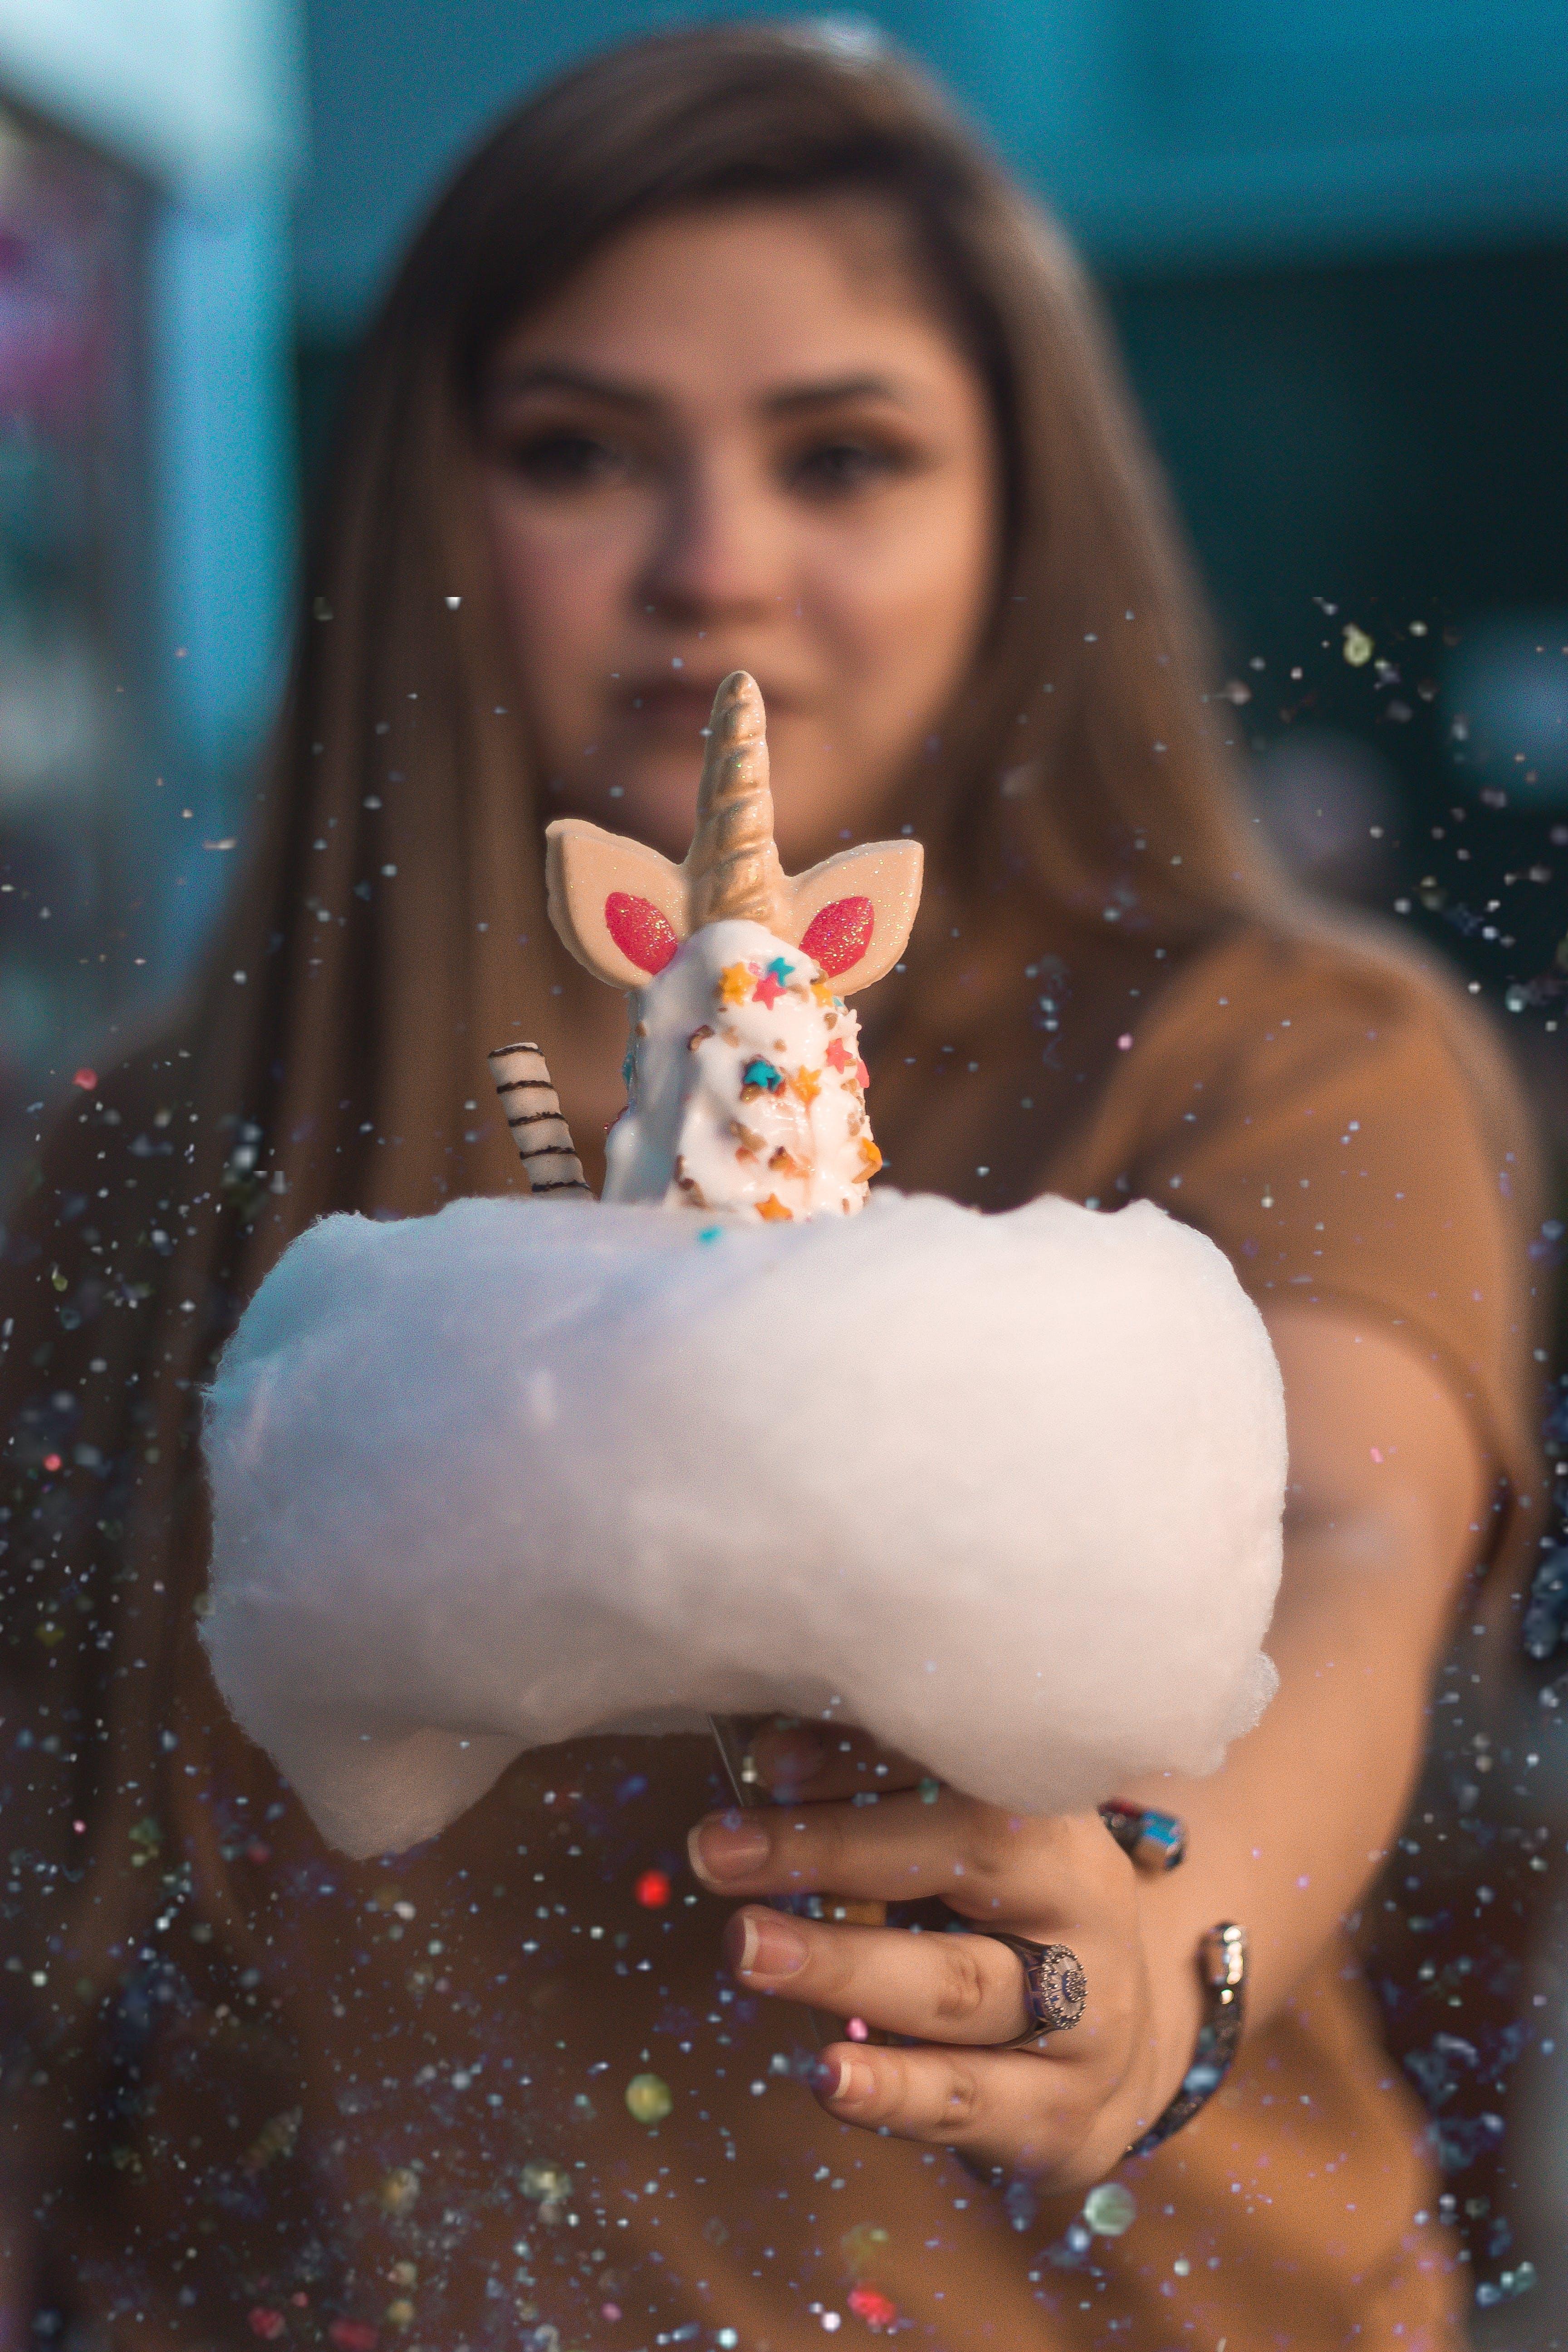 Free stock photo of Adobe Photoshop, beautiful, candy, cloud